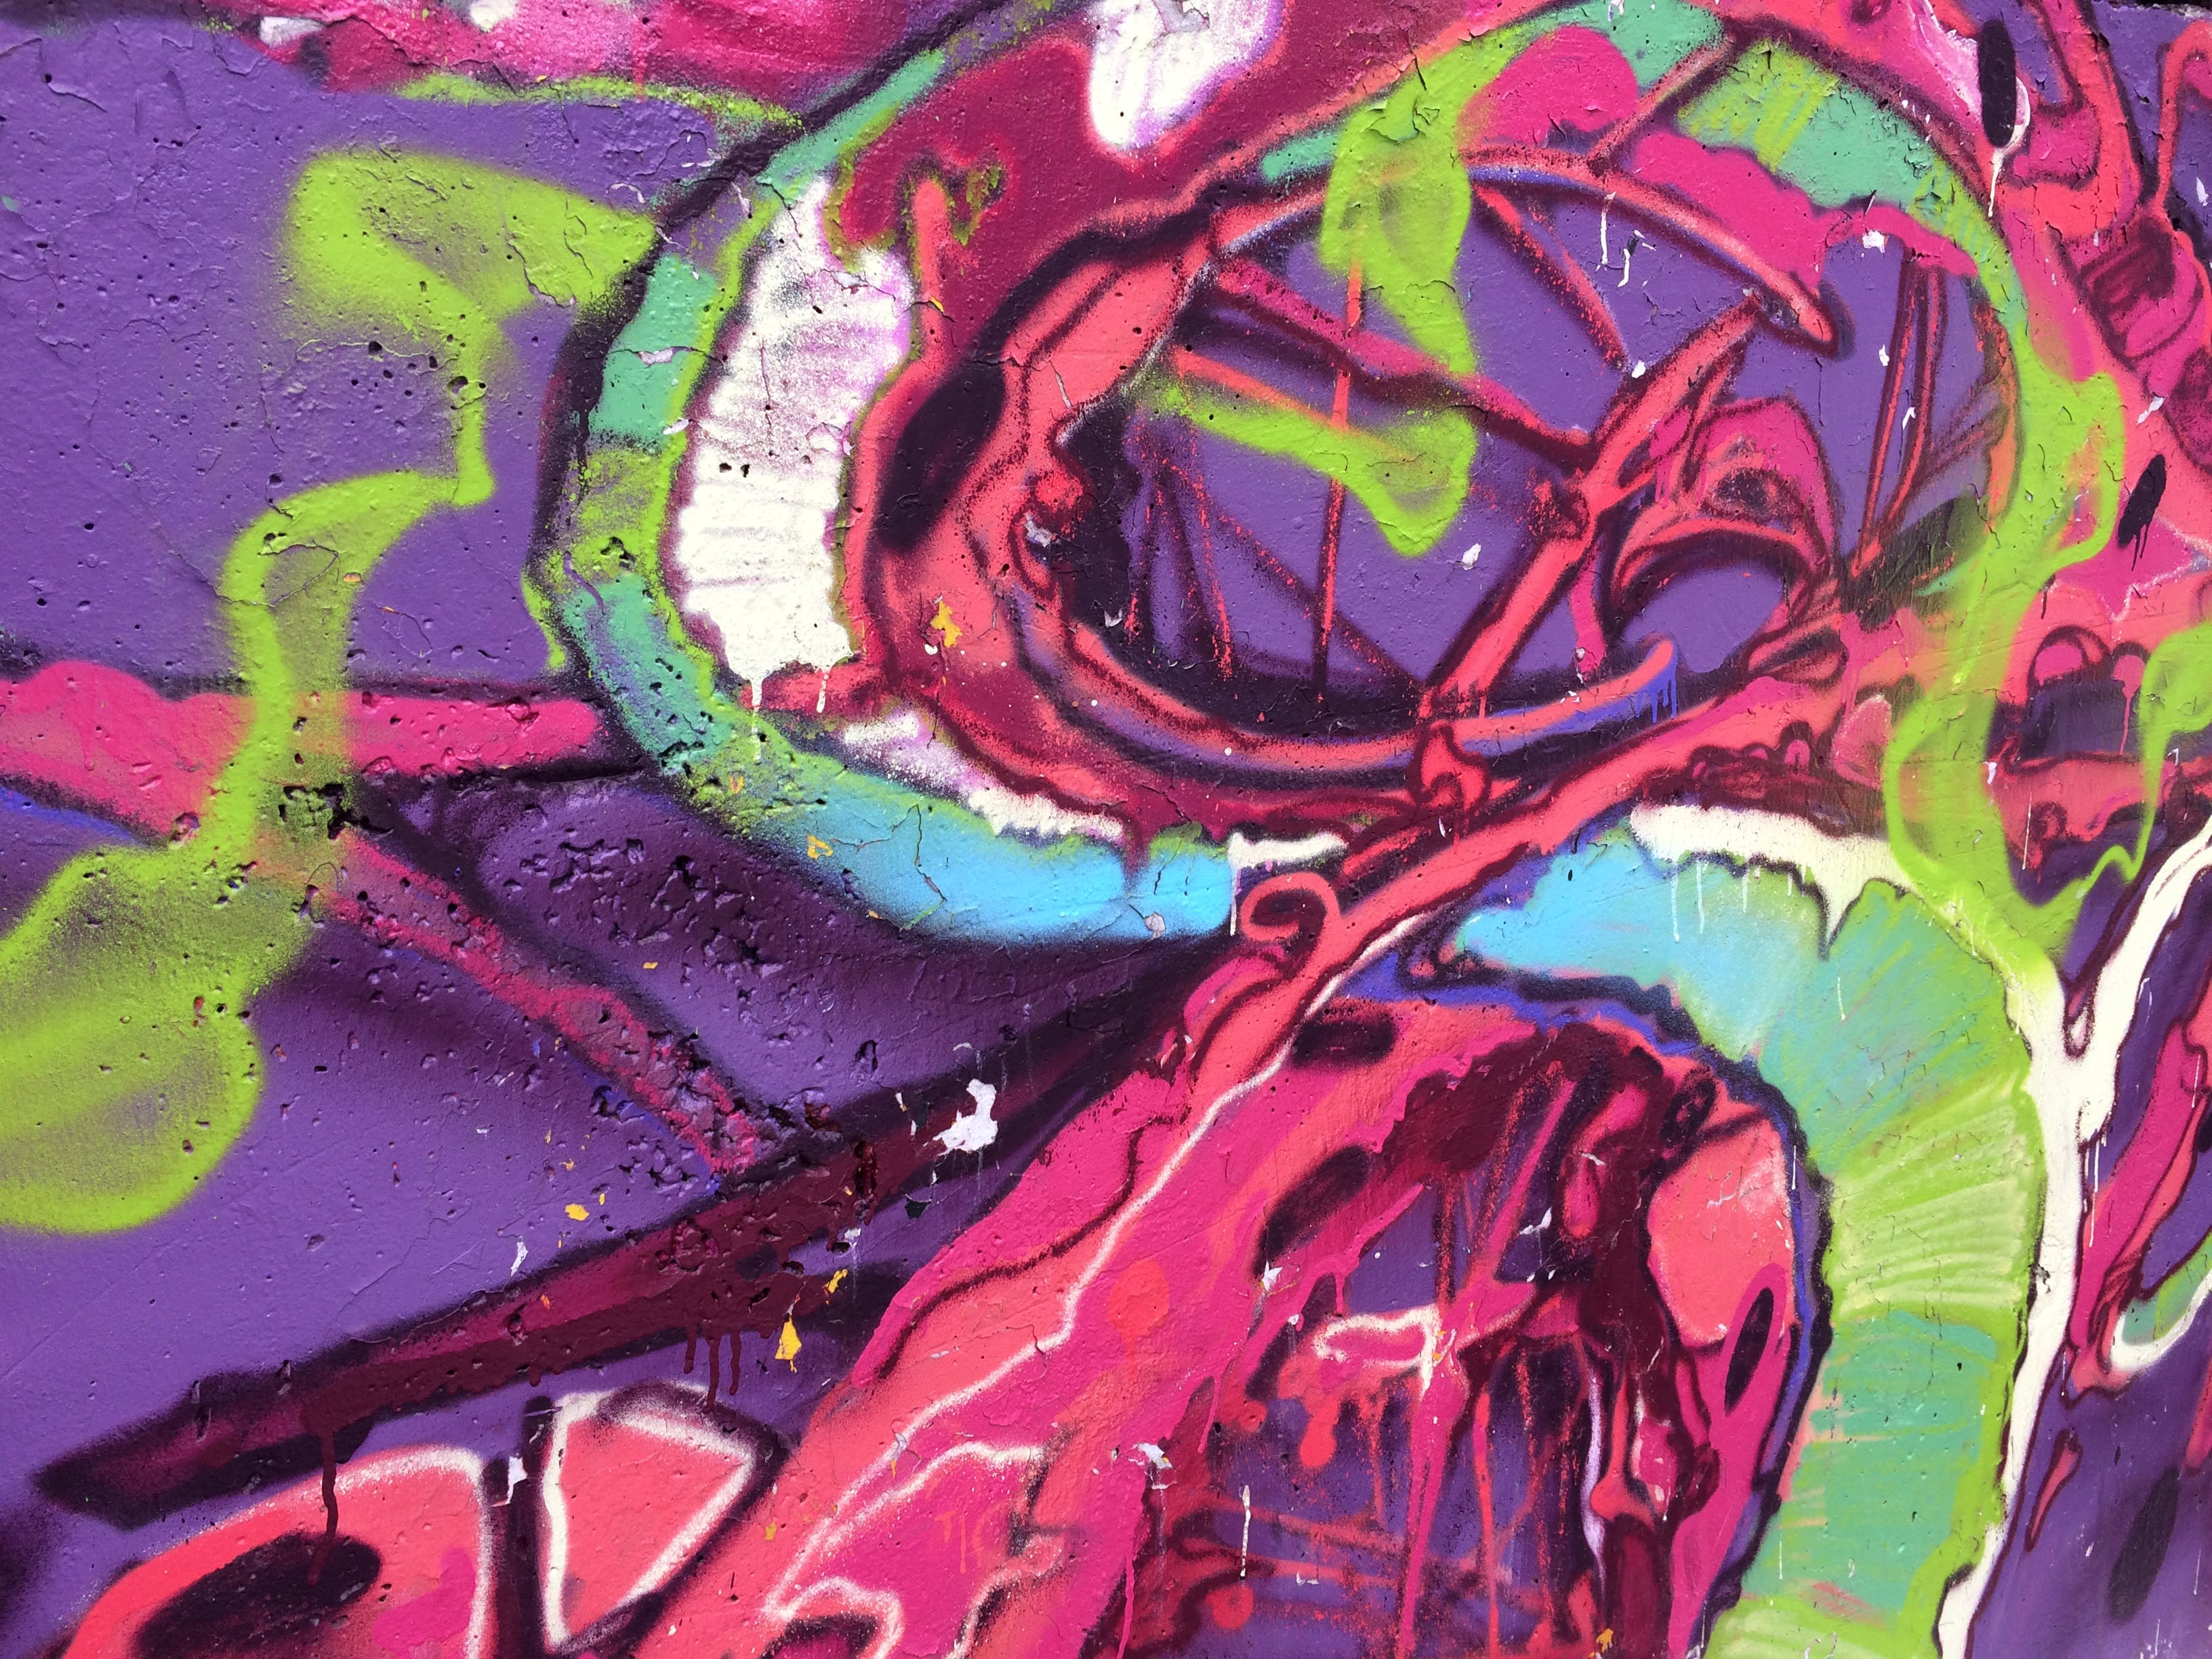 Free stock photo of art, artistic, colorful, graffiti